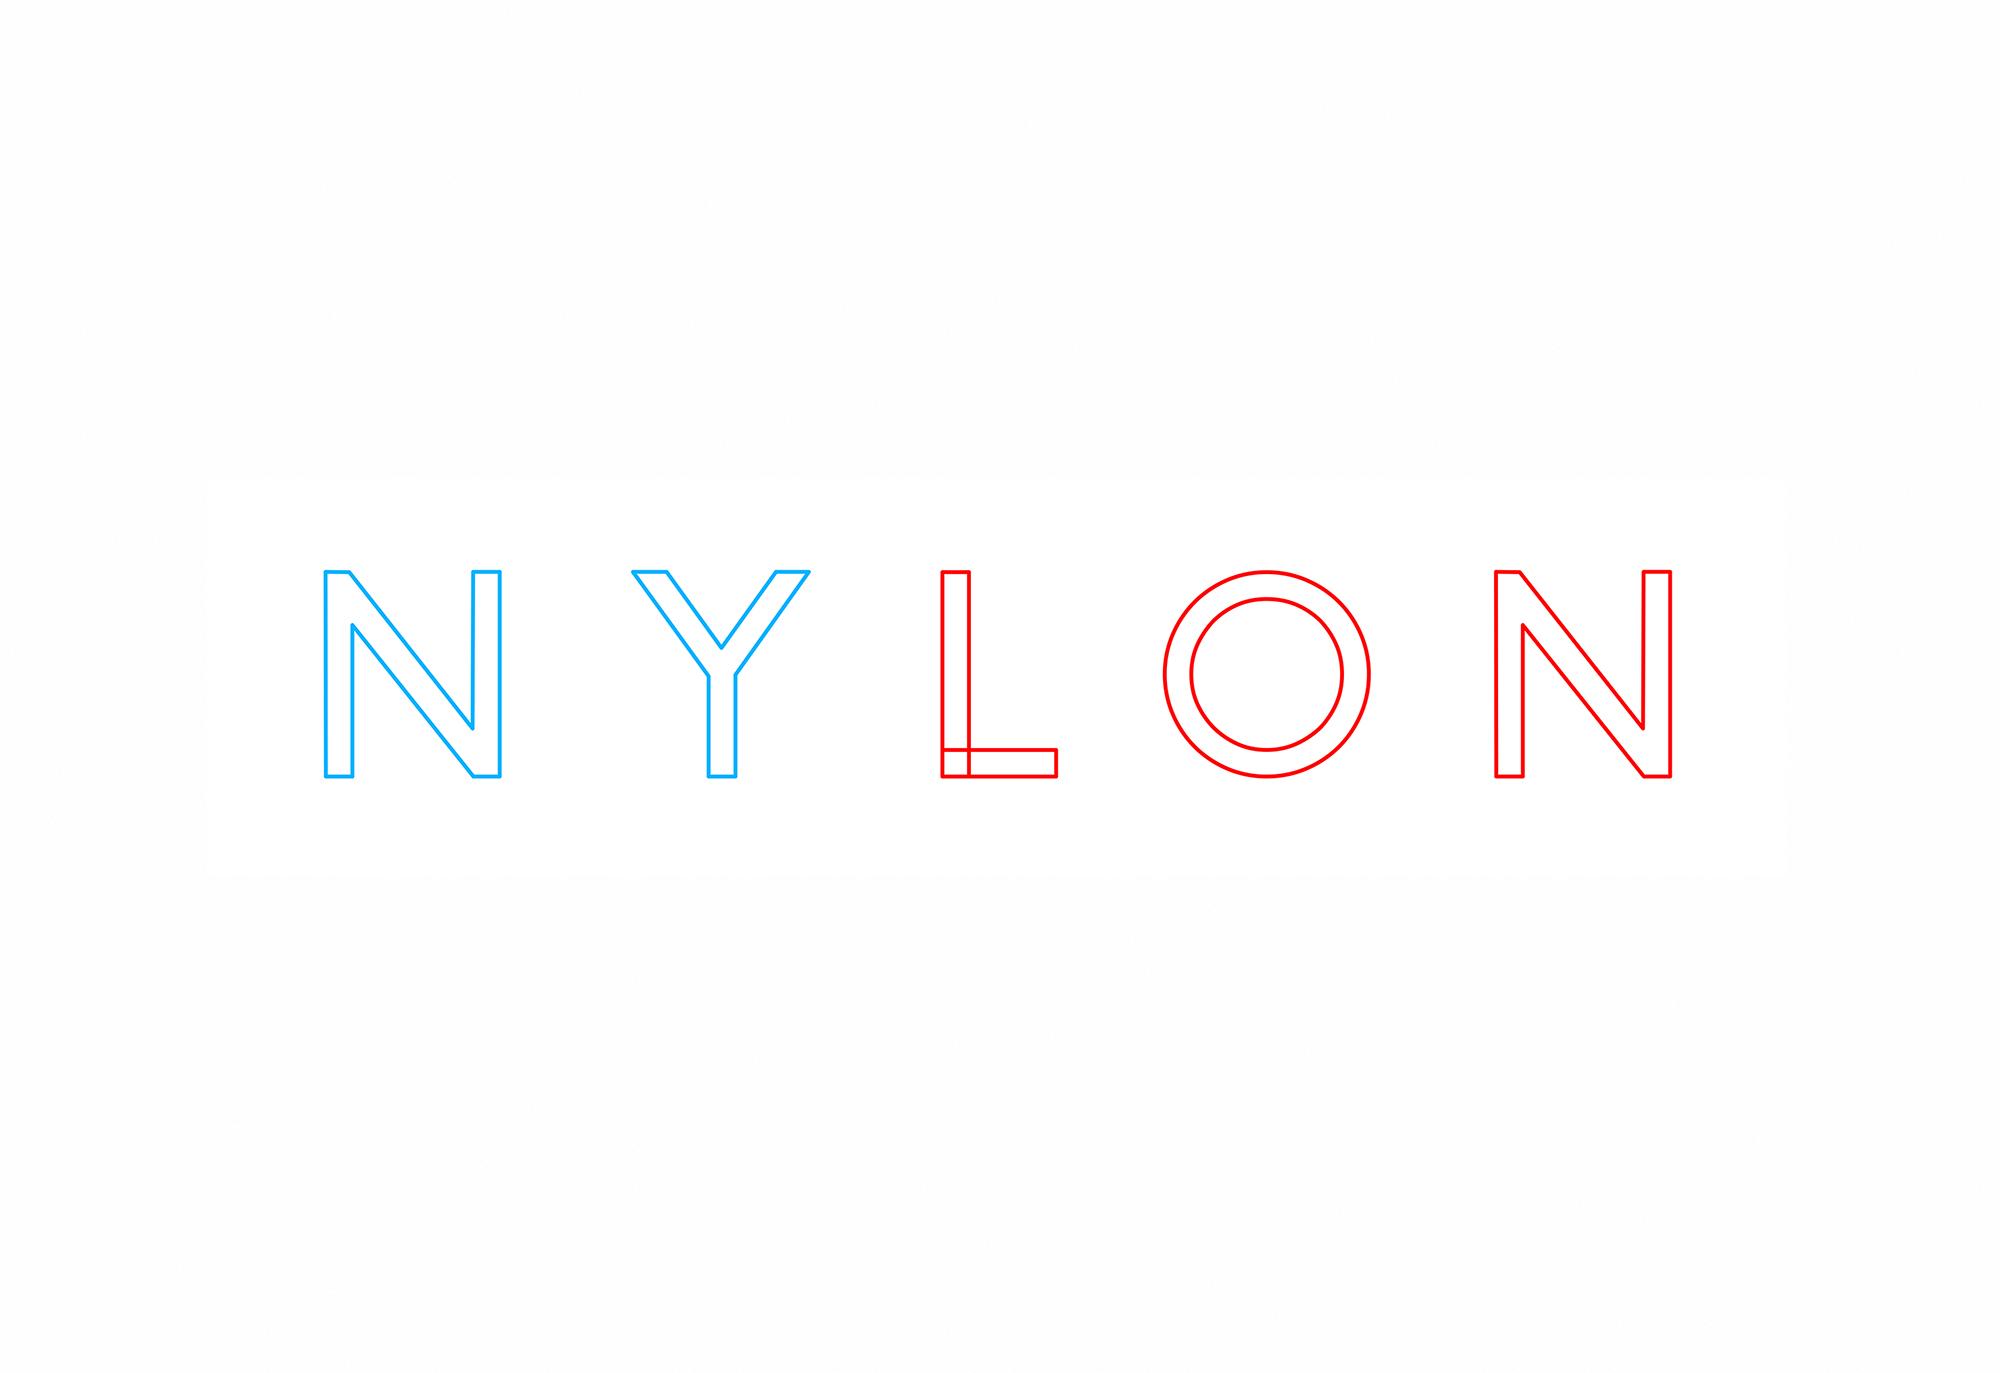 Cover image: NYLON (2013)